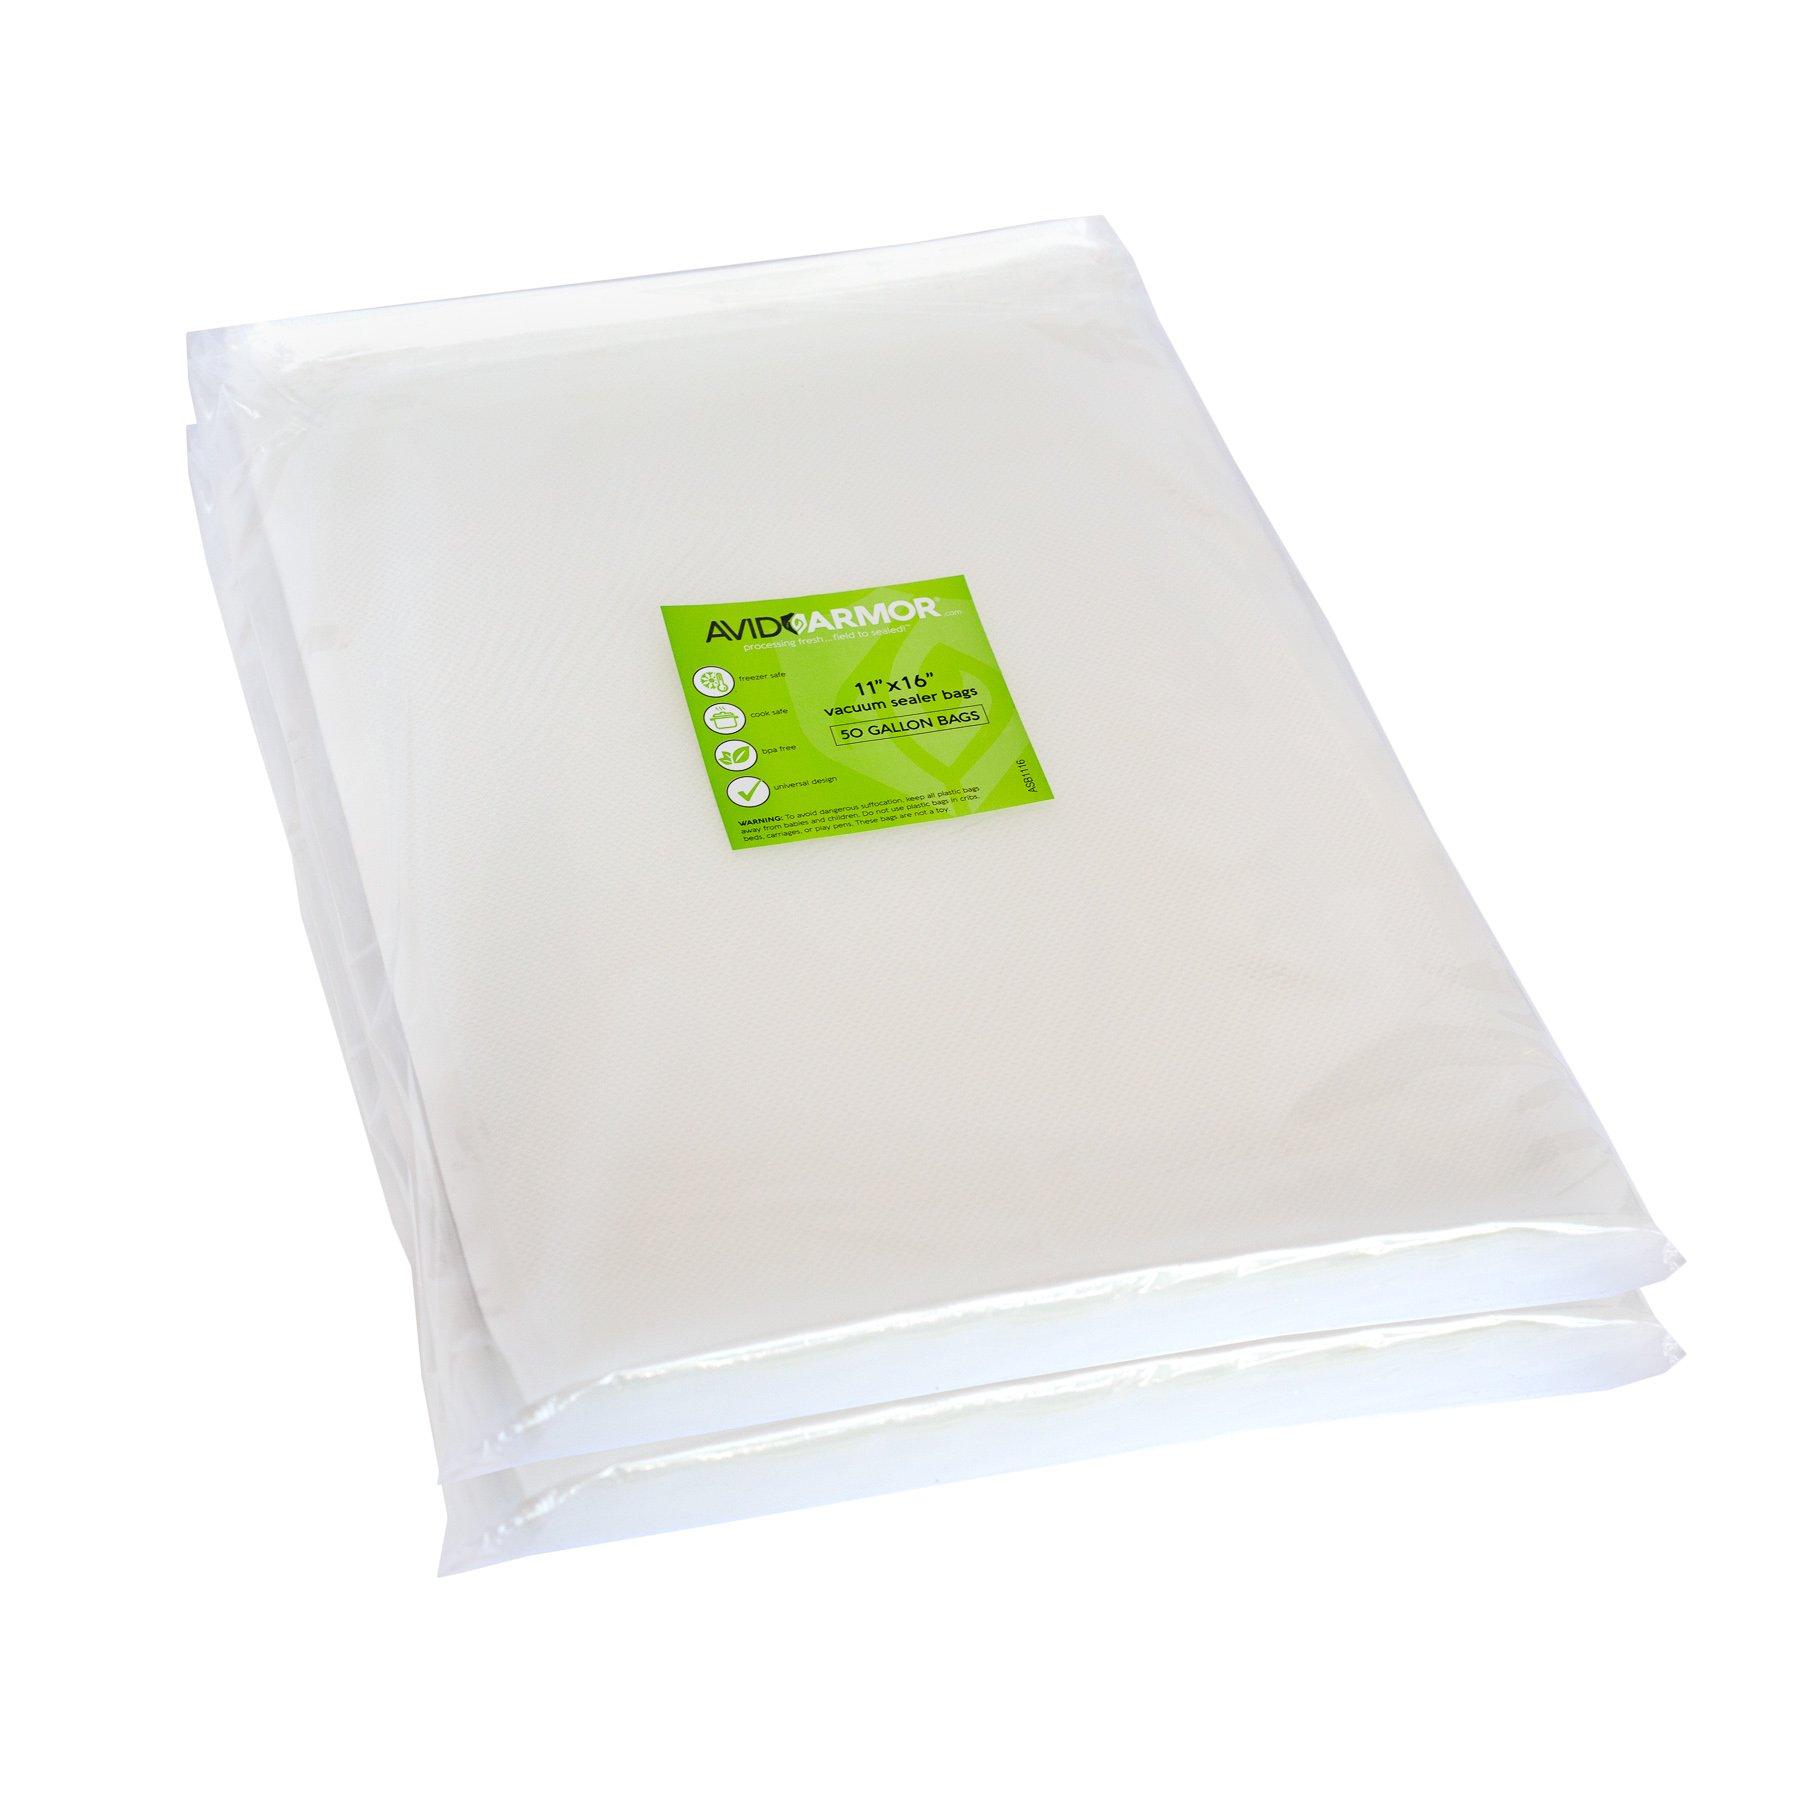 Universal 50 Pint 6x12 Food /& Storage Vacuum Sealer Bags Great Money Saver